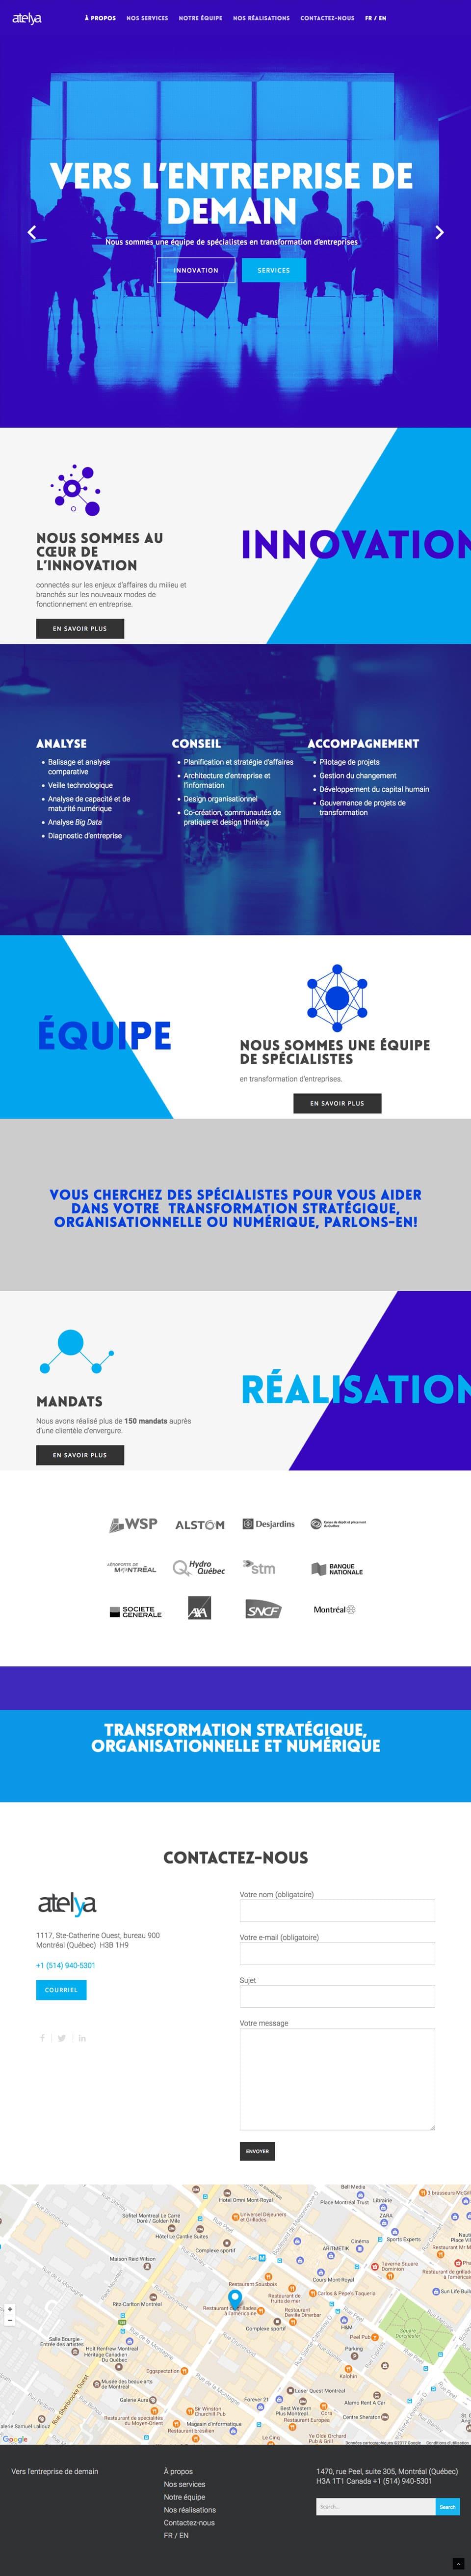 Atelya-Transformateur-entreprise Atelya - Site Web